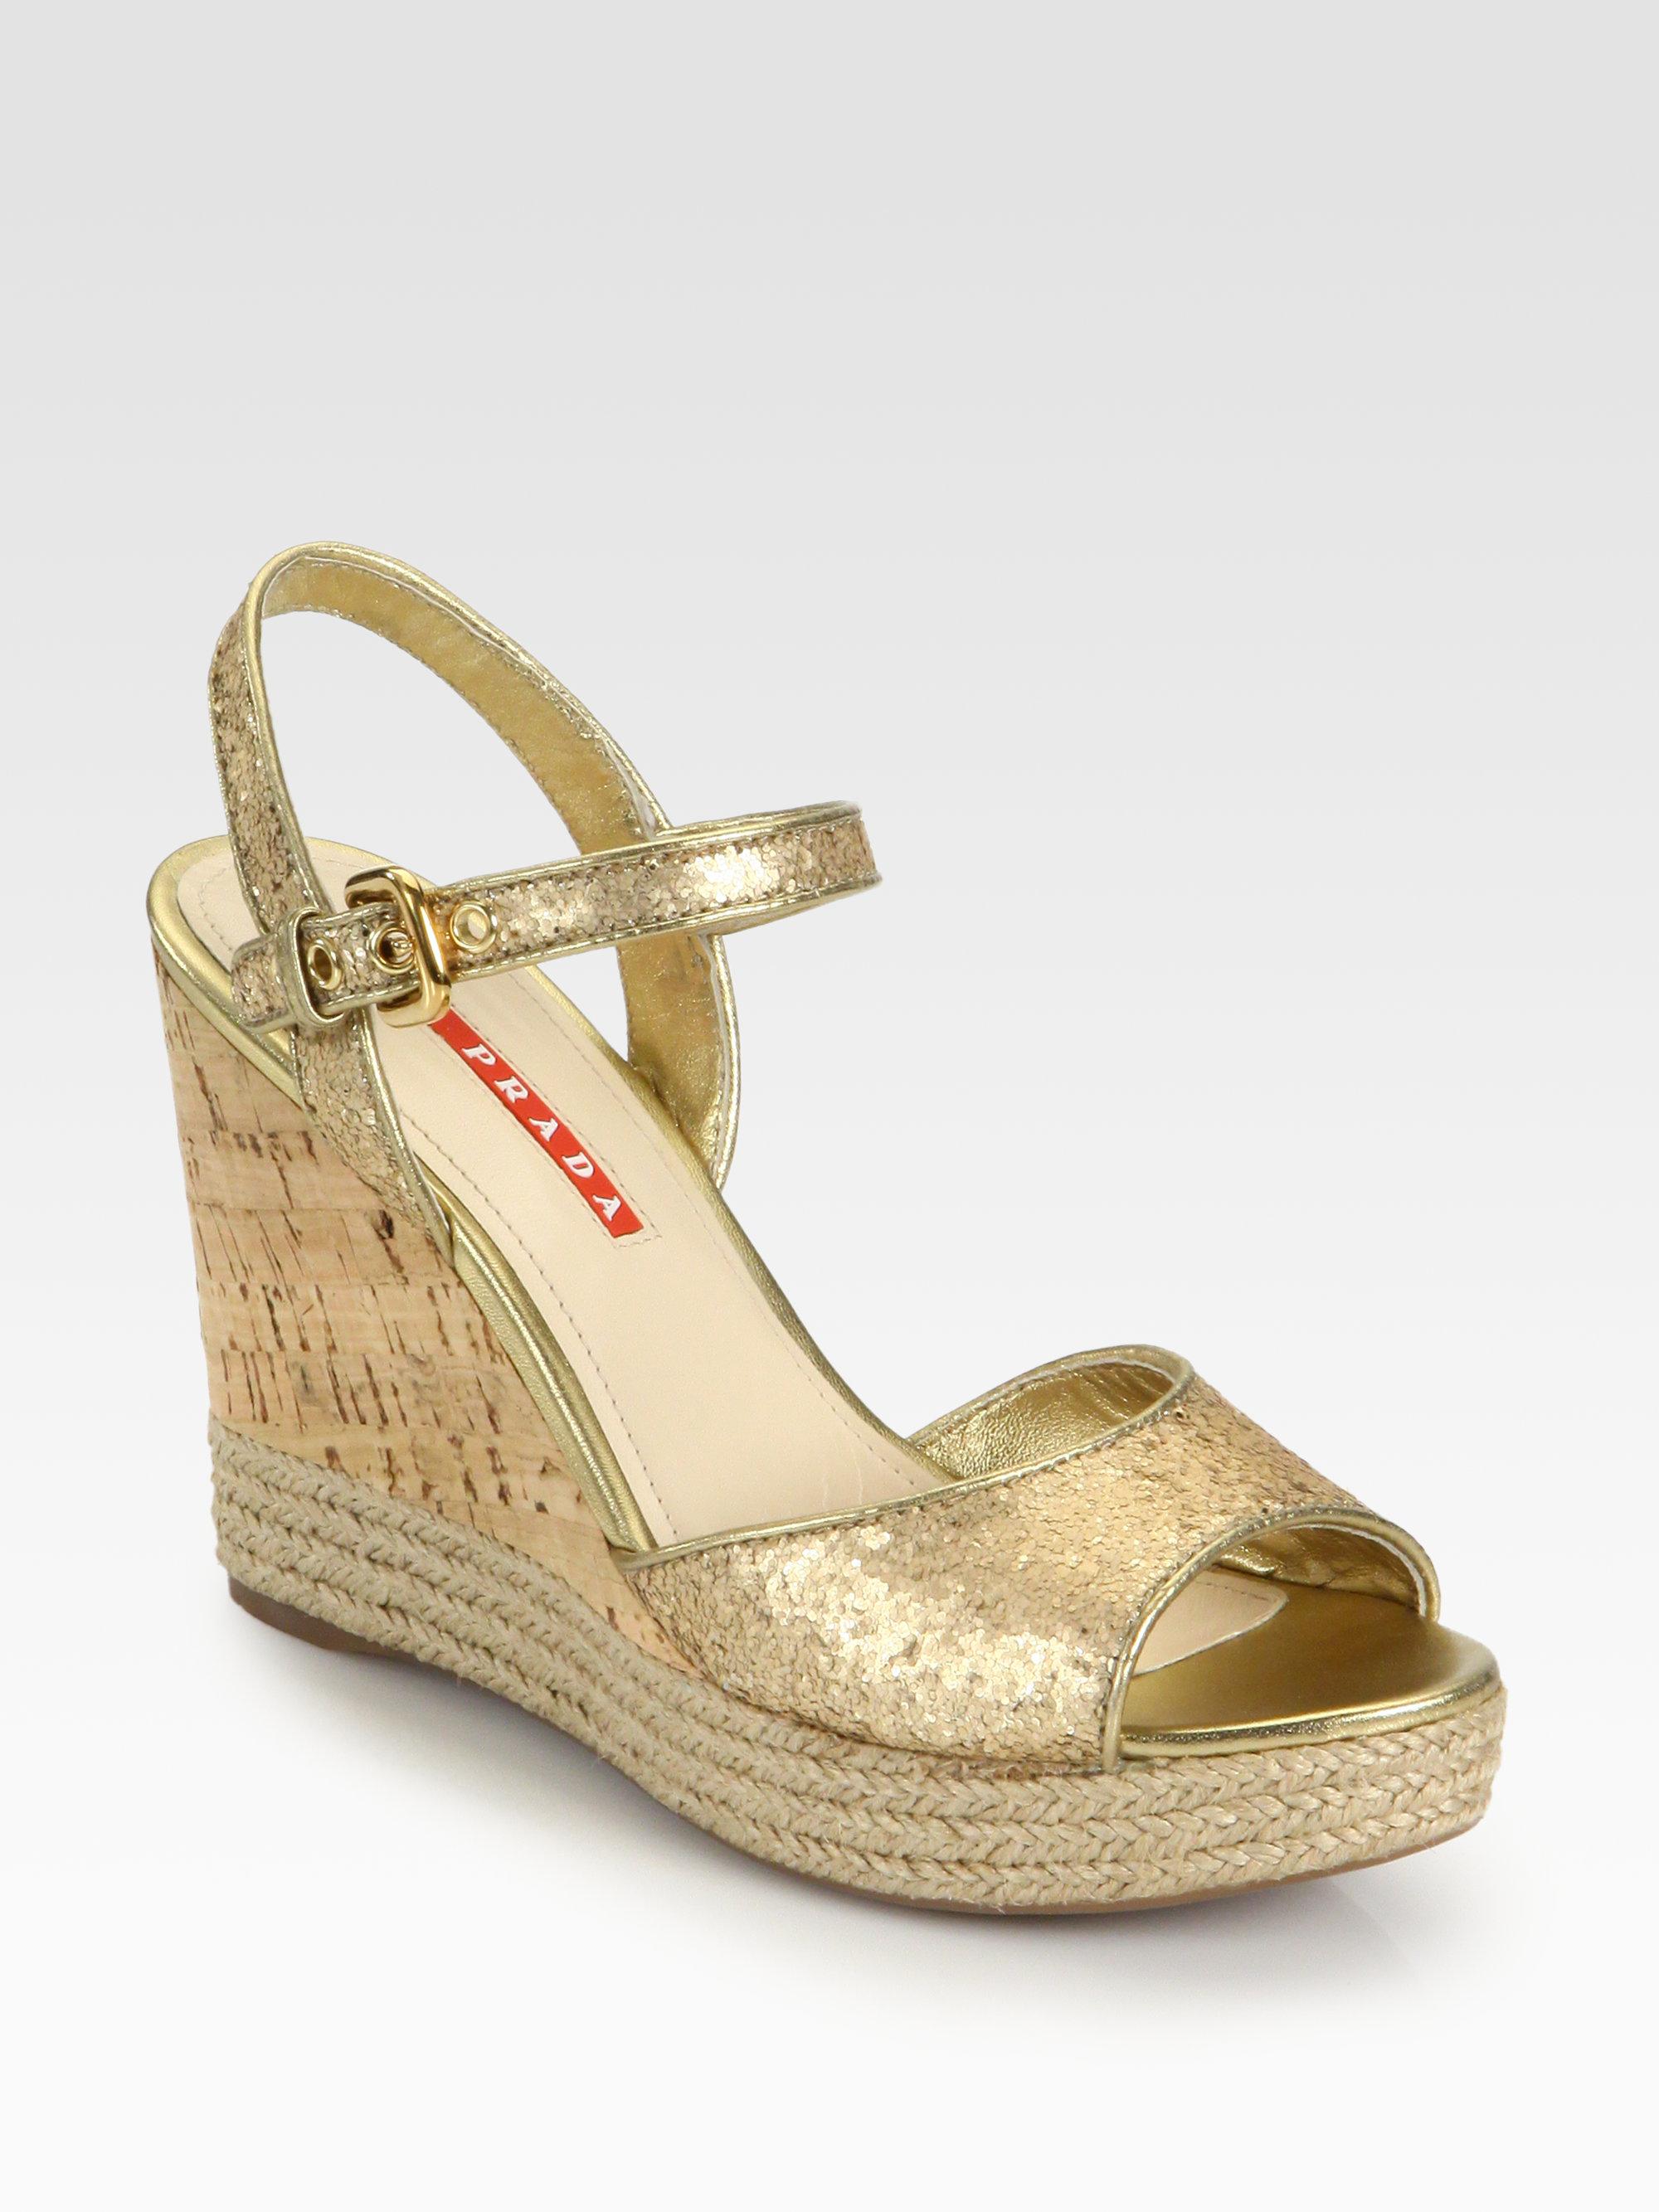 Carlos Women S Gold Wedge Heel Shoes